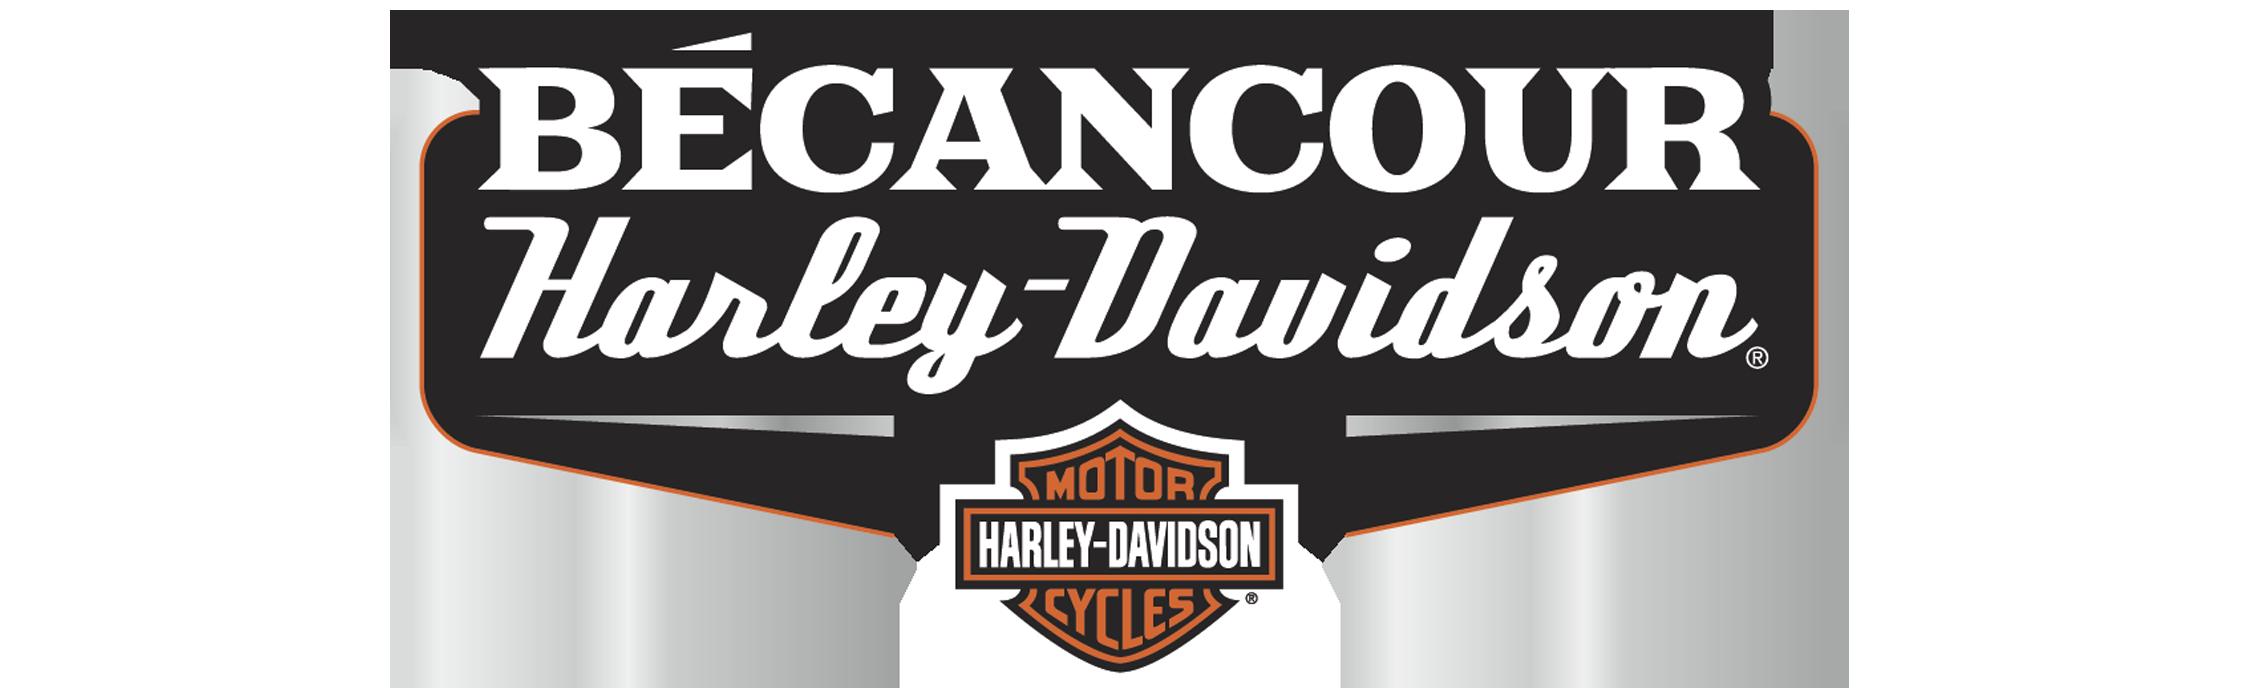 Bécancour Harley-Davidson<sup>®</sup>